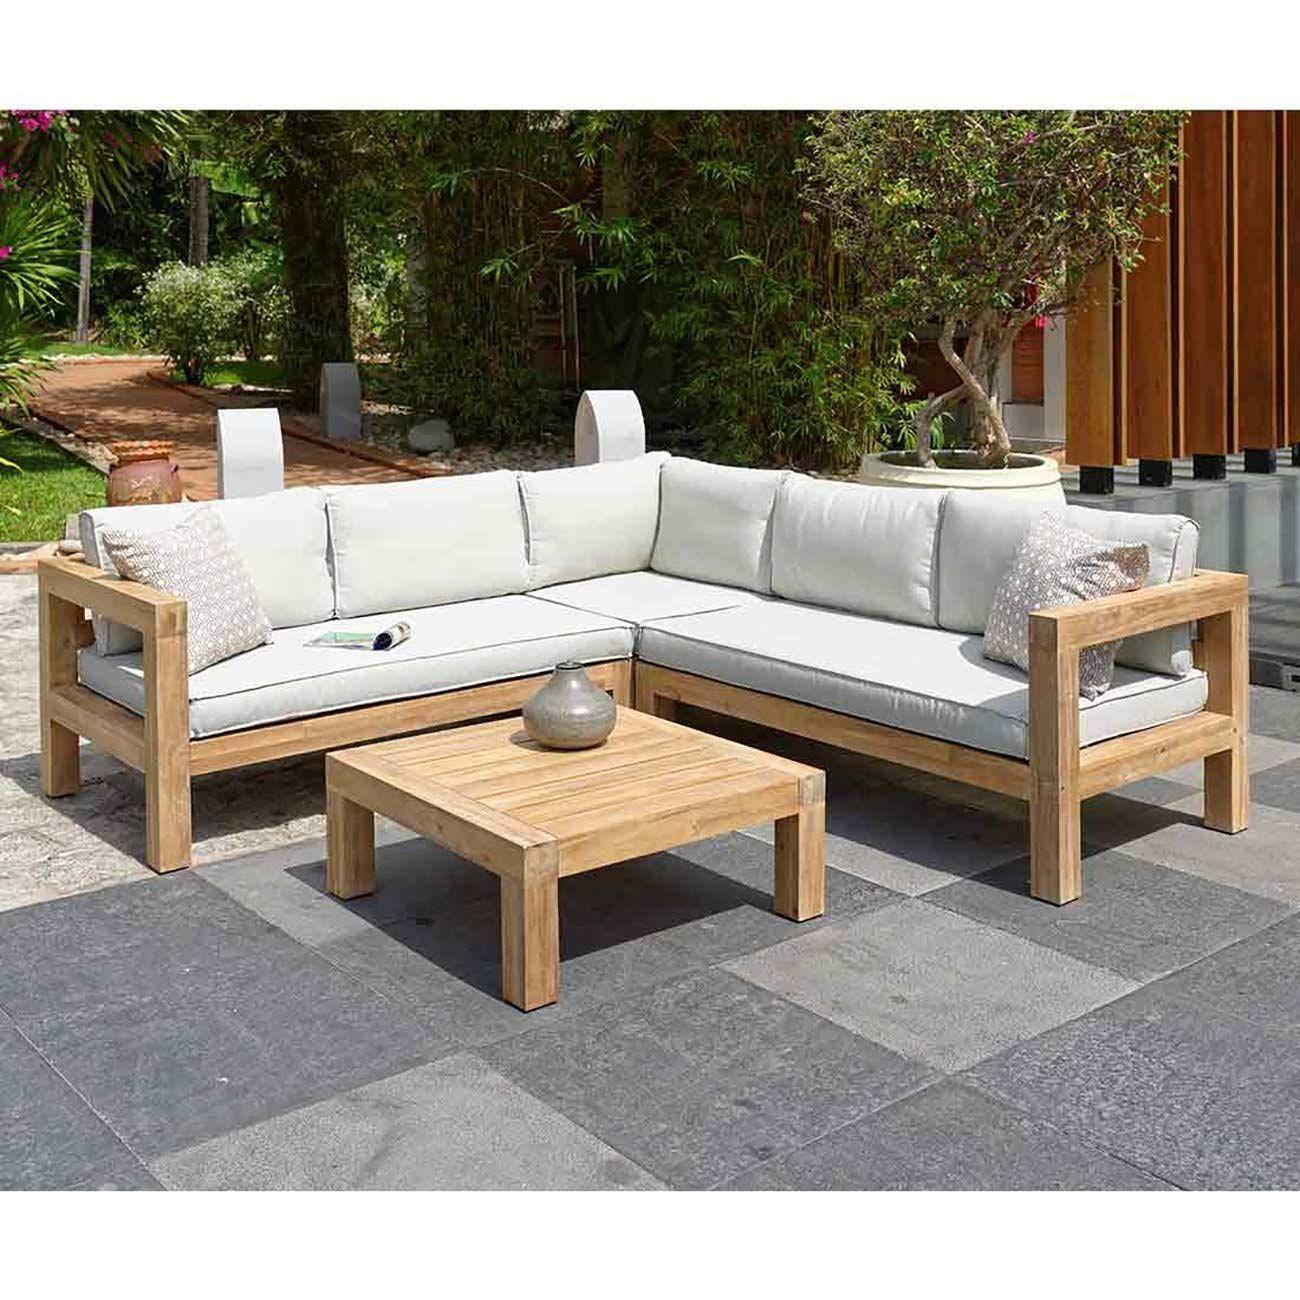 Gut Loungemöbel Holz Stockton Loungeecke 4 Teilig Akazie/Polster